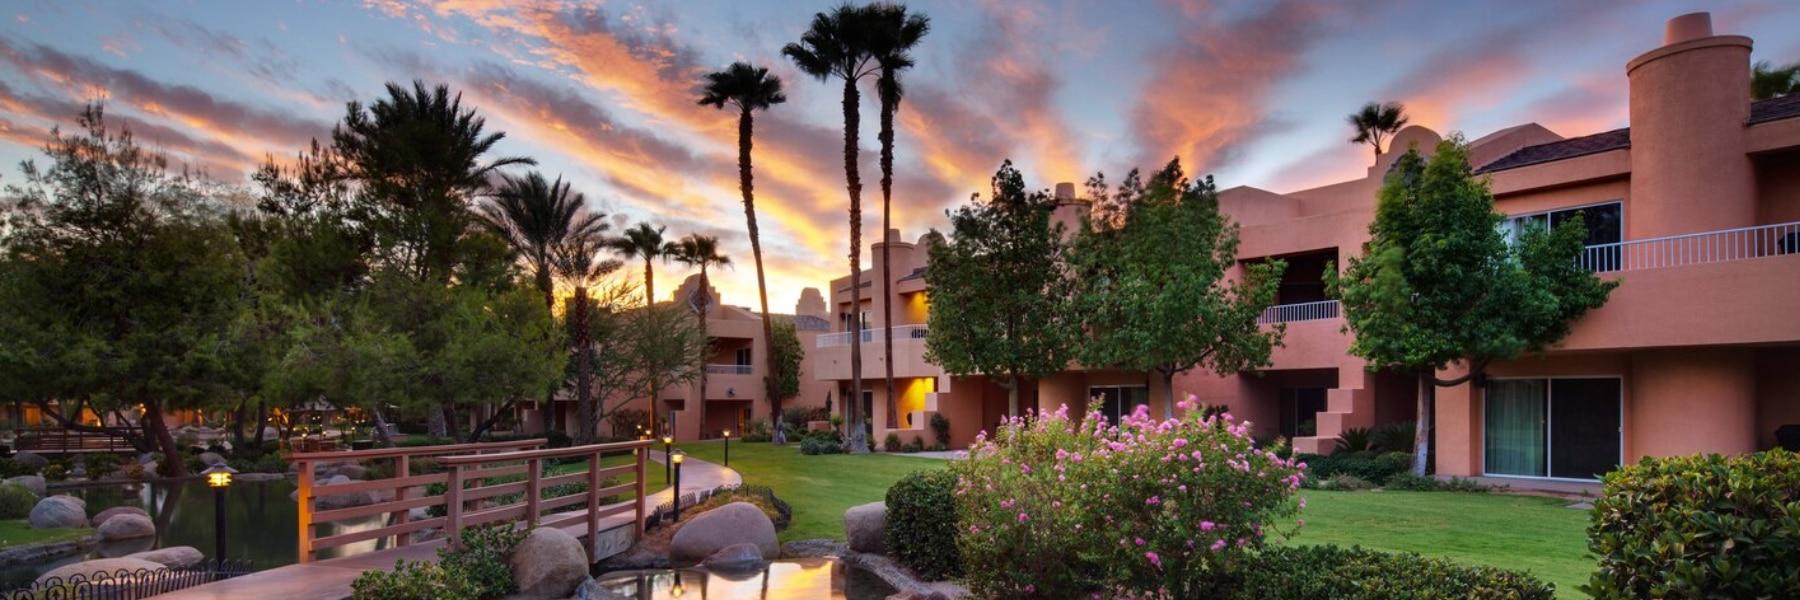 The Westin Mission Hills Resort Villas, Palm Springs